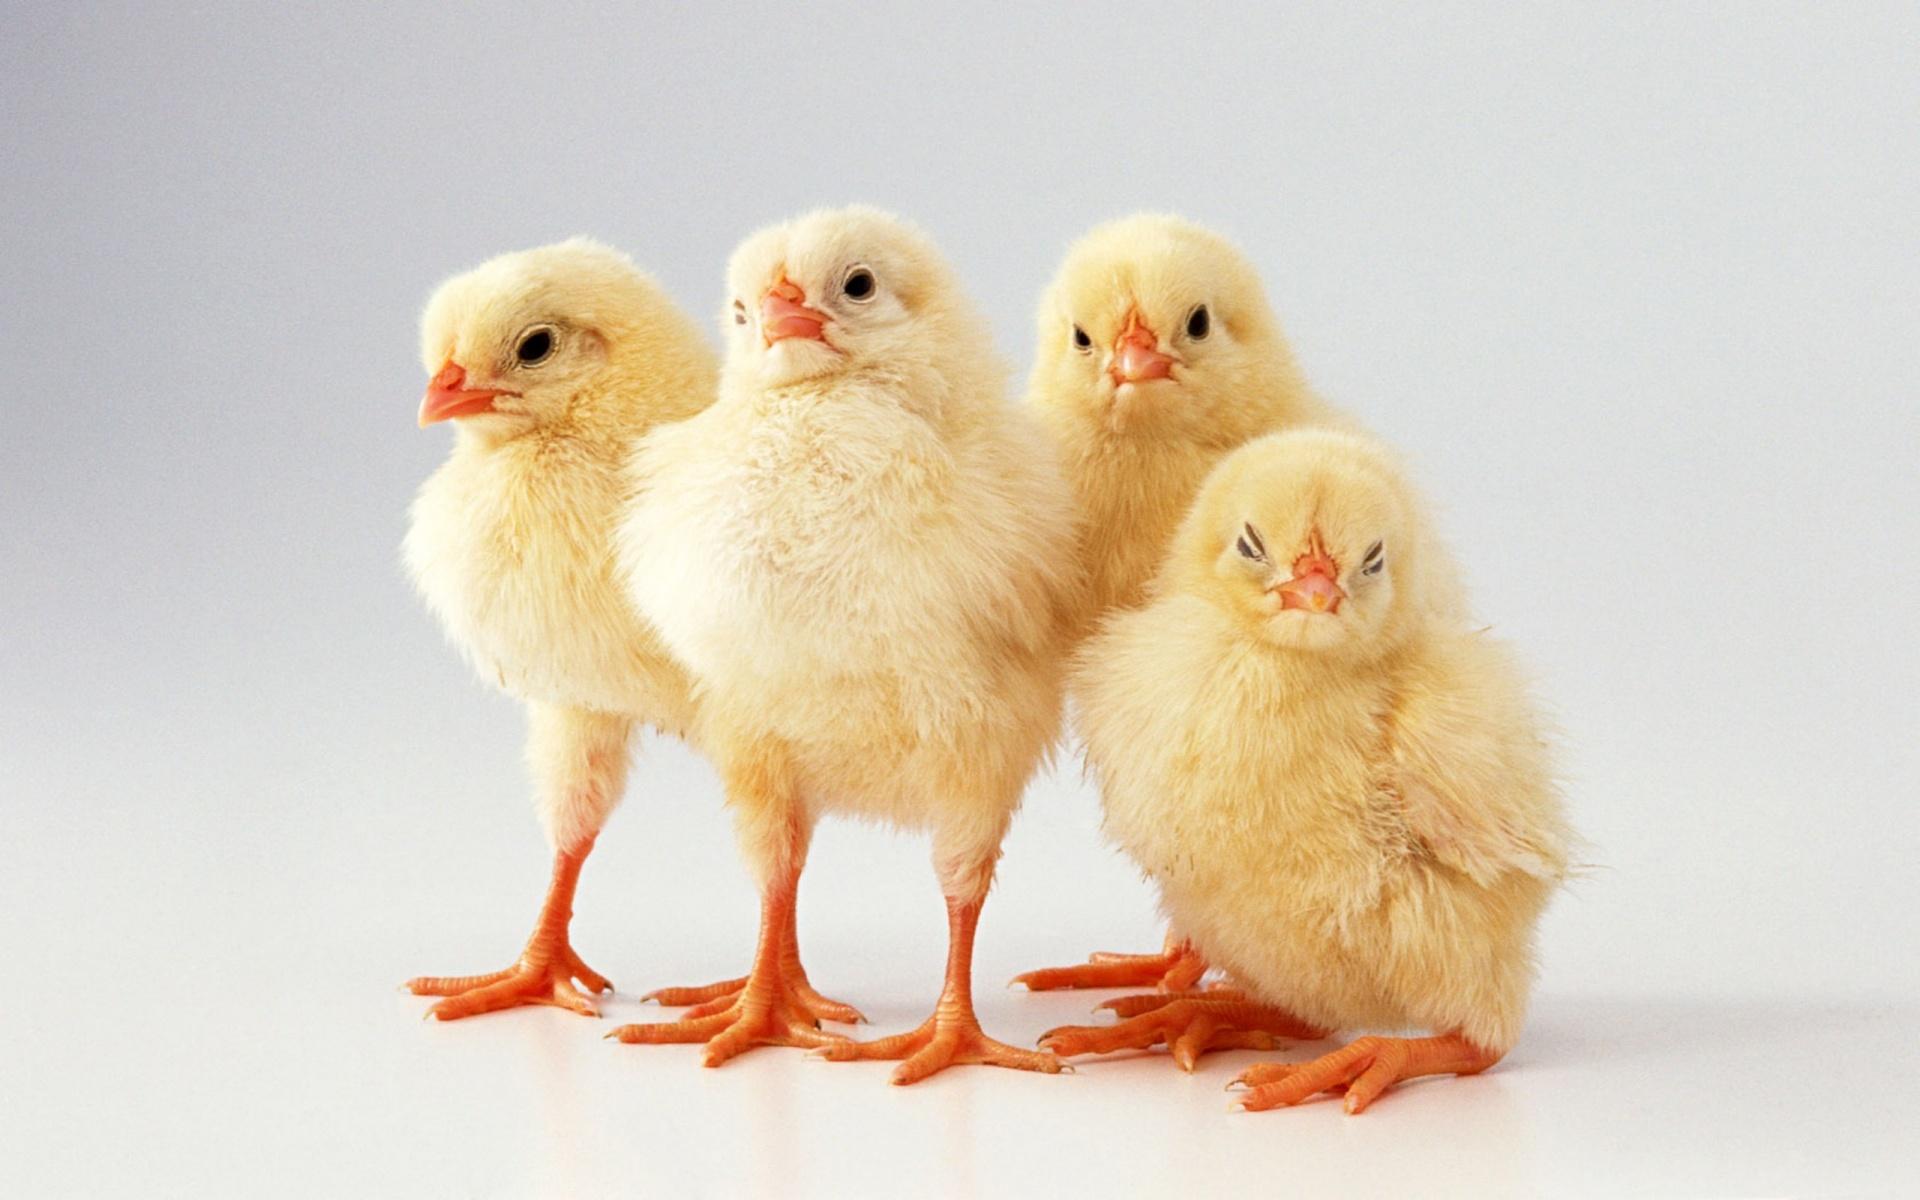 chickens full hd wallpaper for desktop